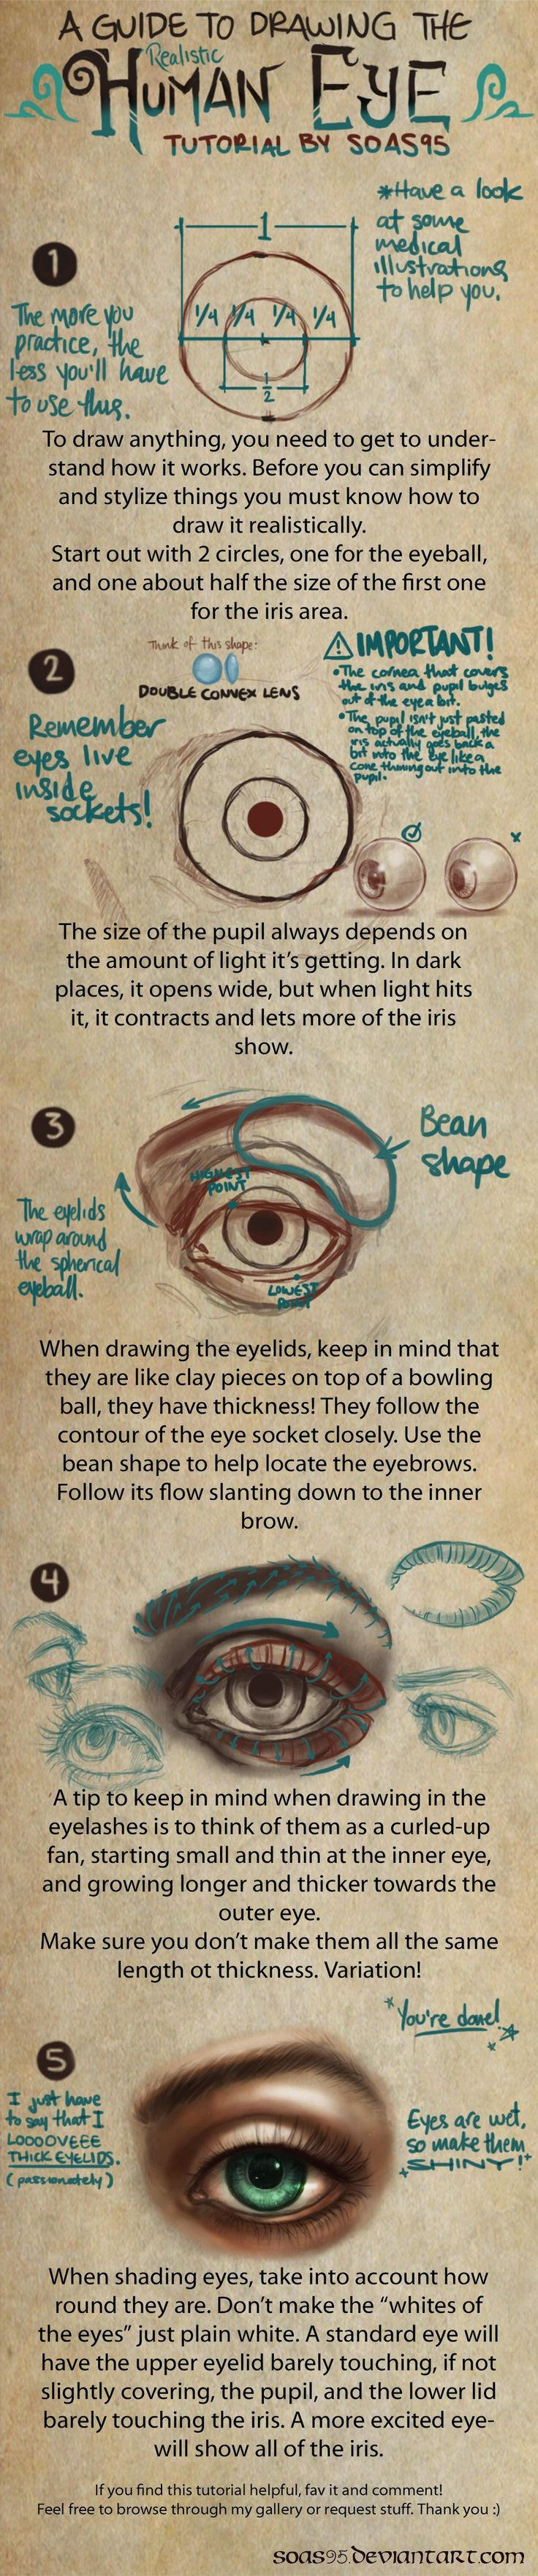 Human Eye- TUTORIAL by *soas95 on deviantART http://soas95.deviantart.com/art/Human-Eye-TUTORIAL-392610867